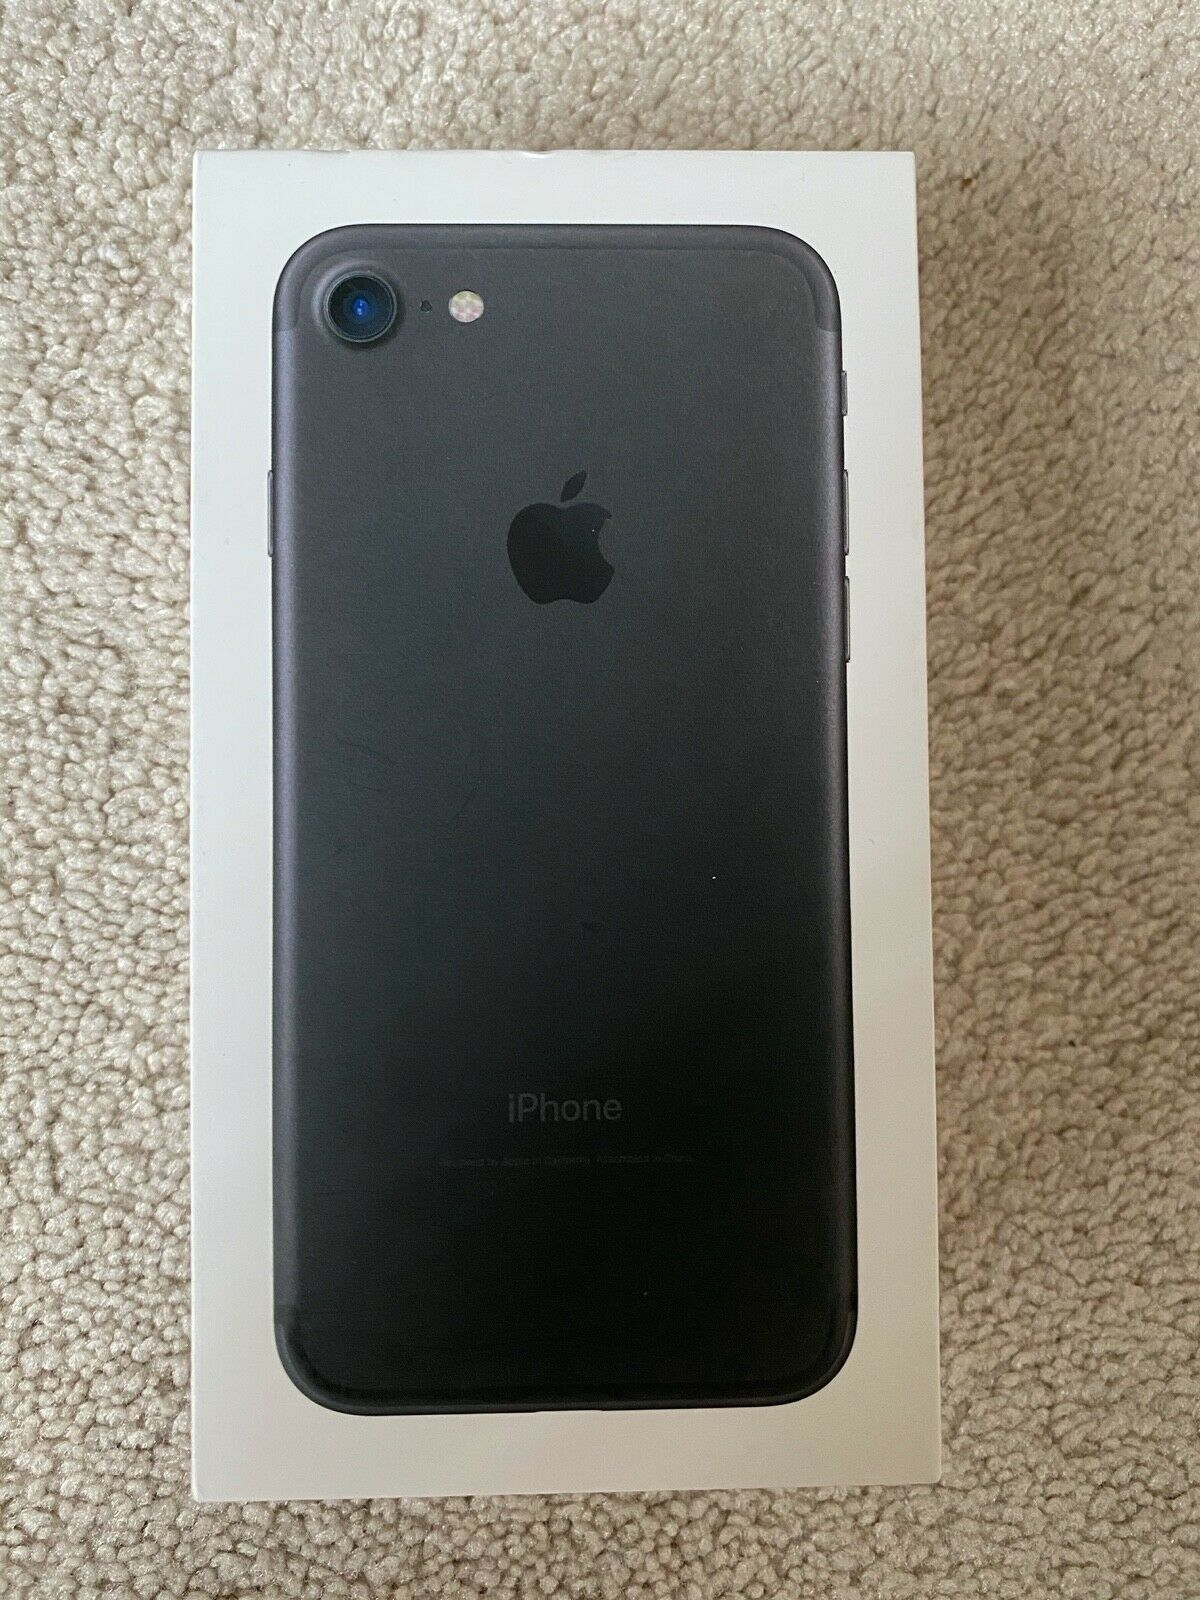 Apple iPhone 7 - 32GB - Black (Boost Mobile) A1660 (CDMA + GSM)